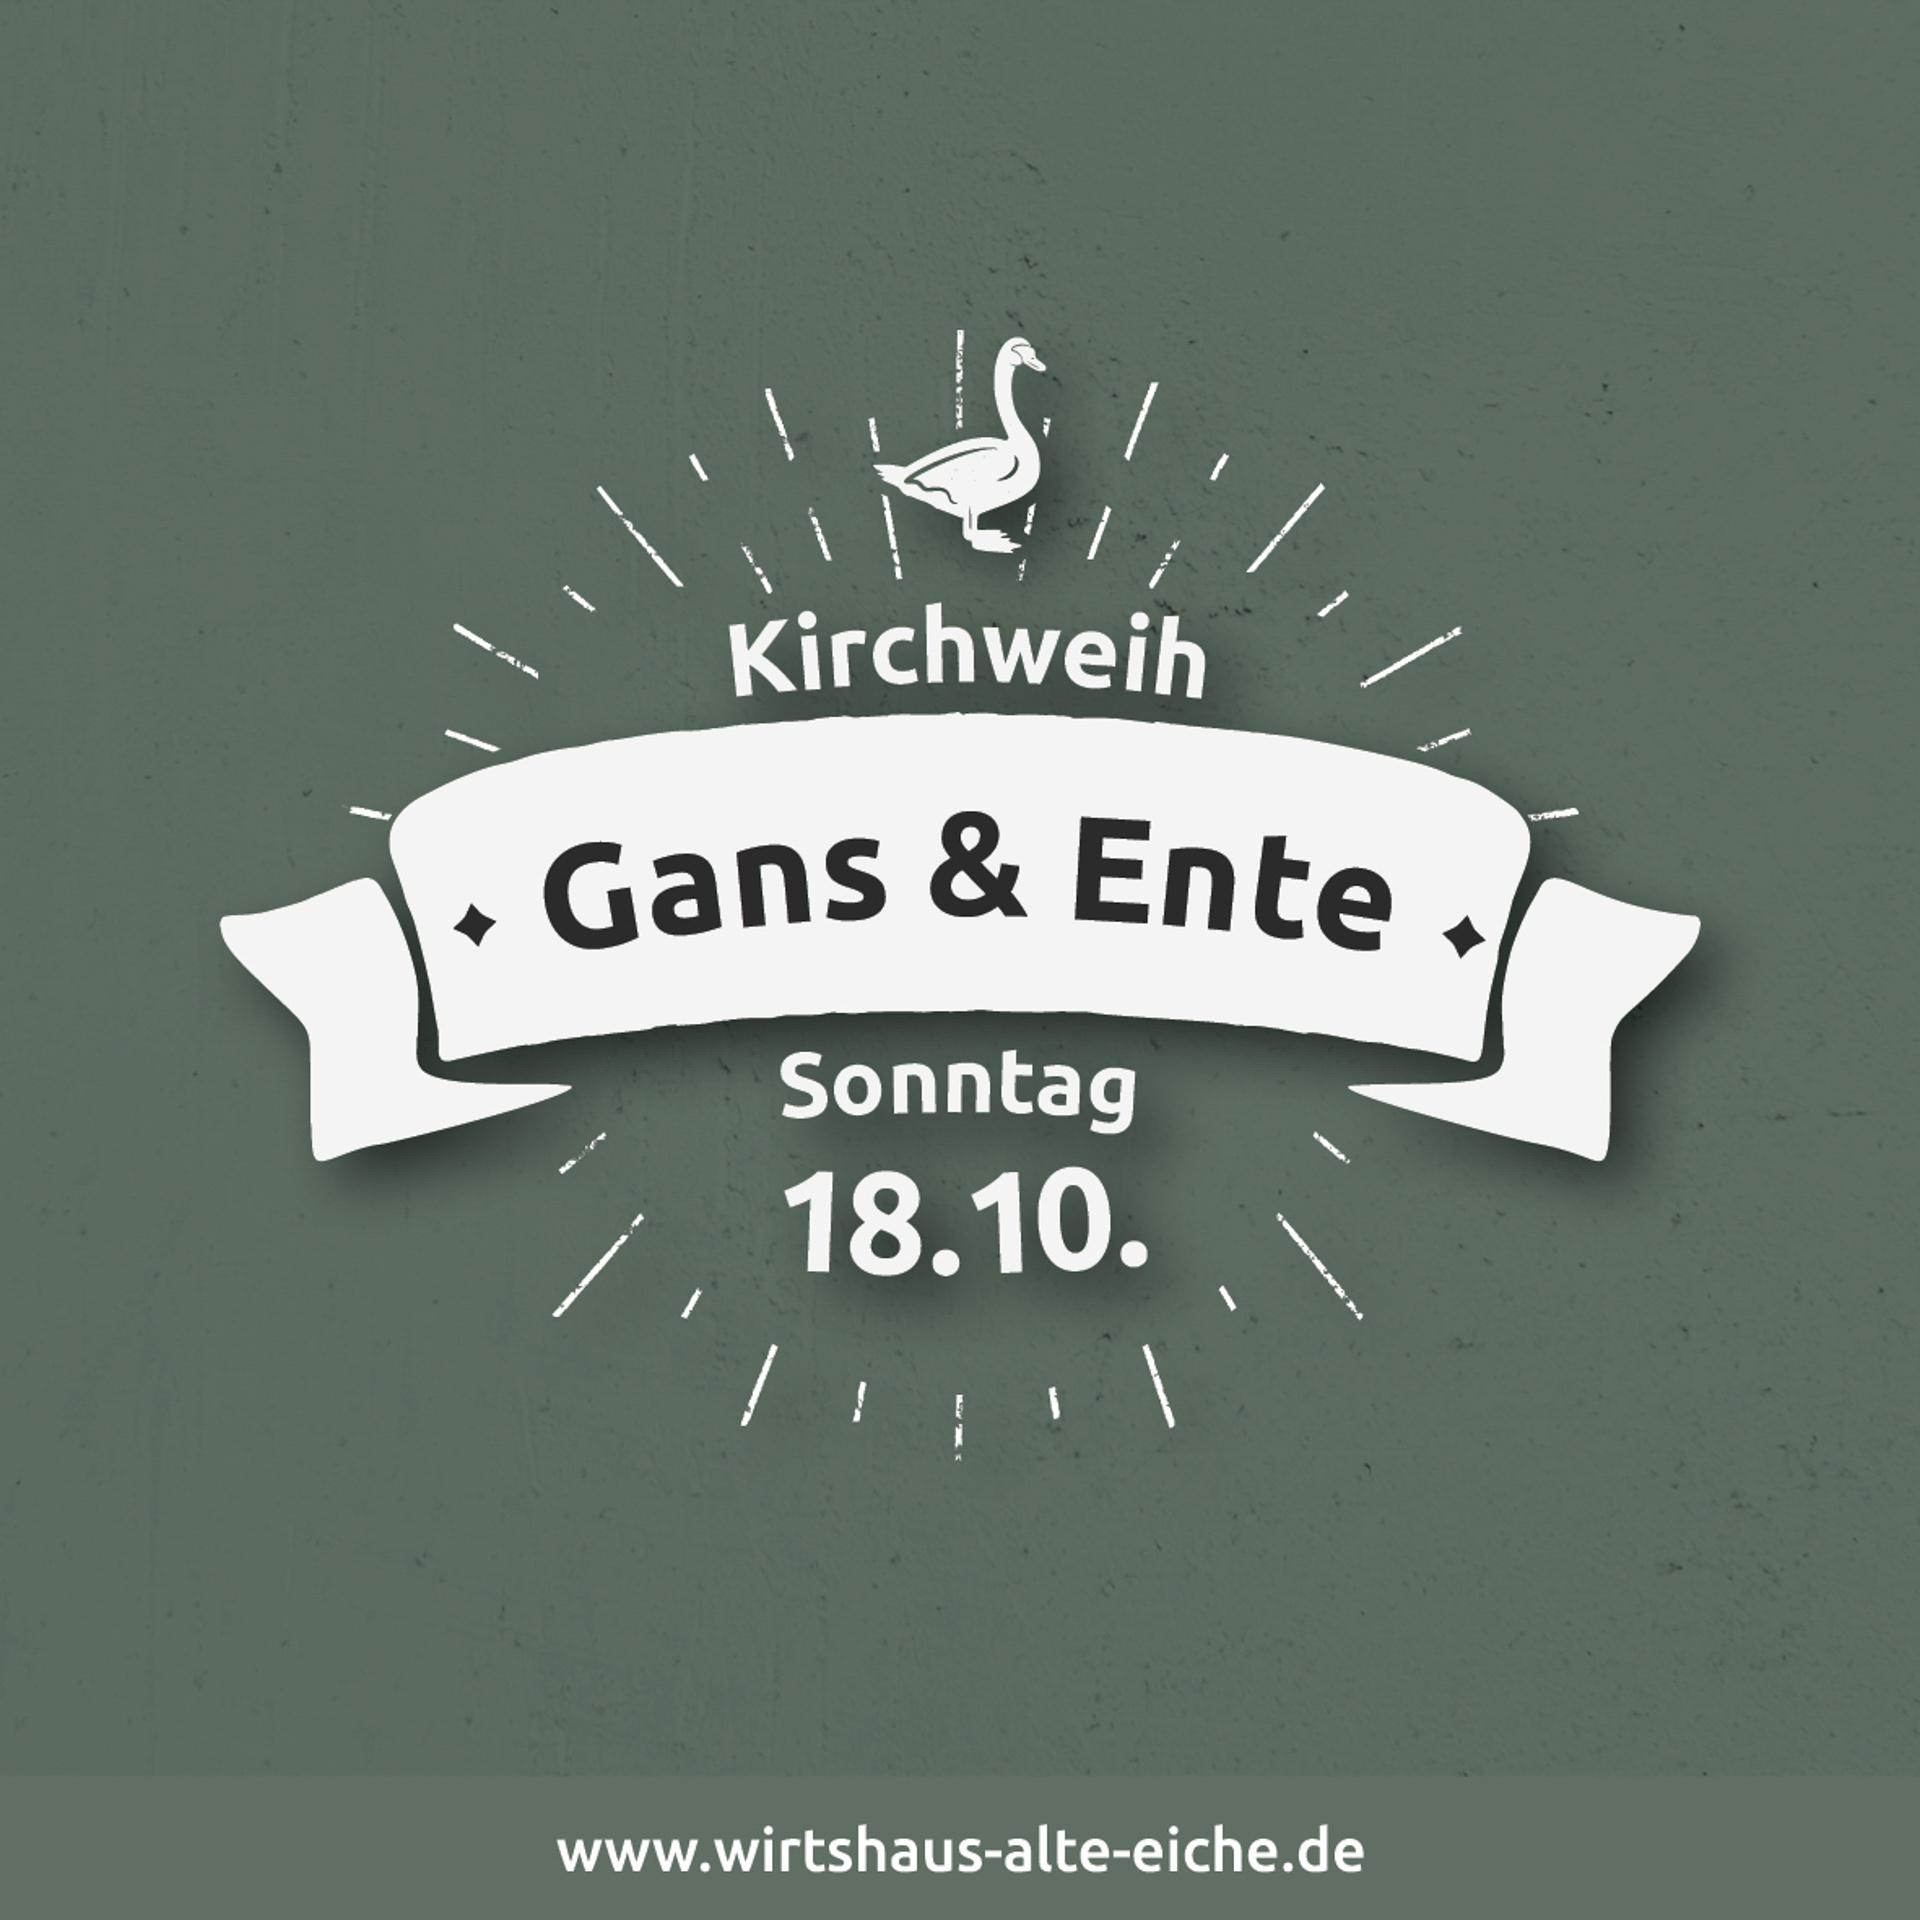 gniced-daniel gross-pfaffenhofen-grafikdesign-digital-assets-posting-11